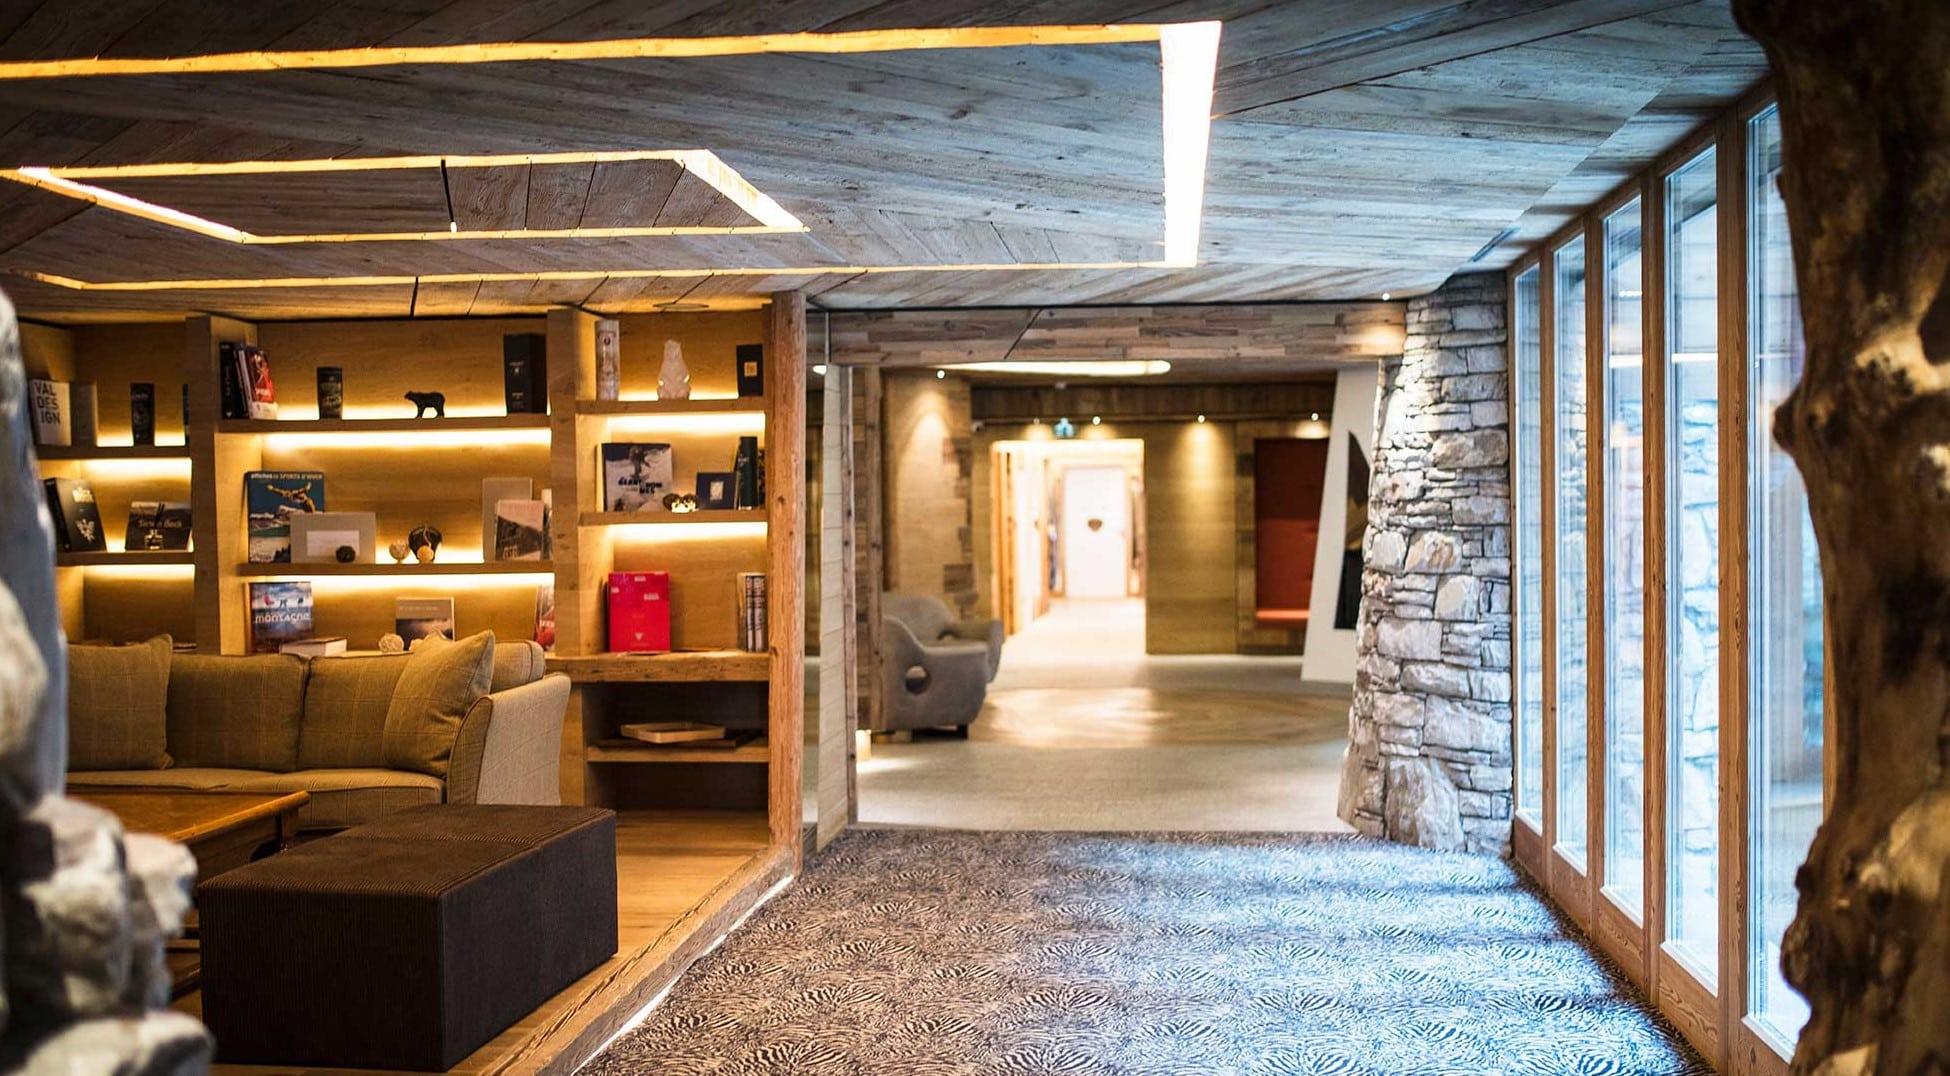 Les Barmes de L'ours, a hotel with authentic charm at Val d'Isère